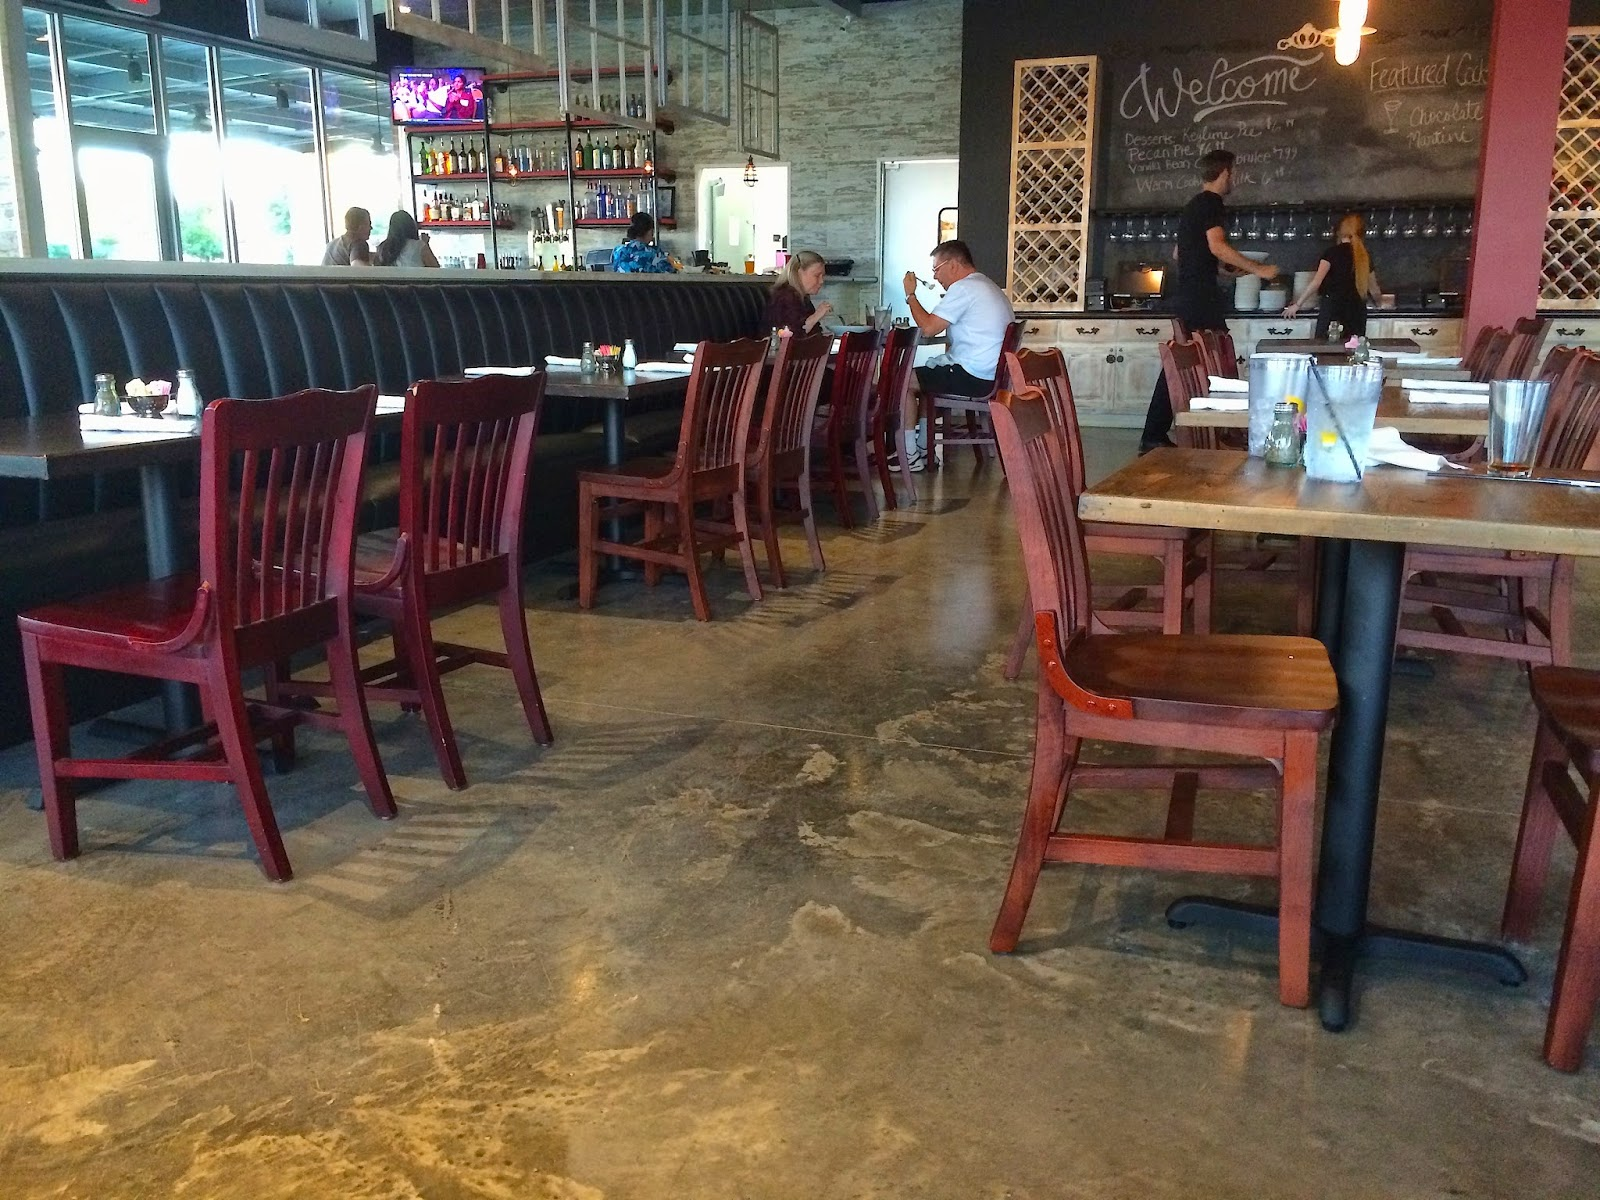 Livin The Good Life: Barnlight Eatery